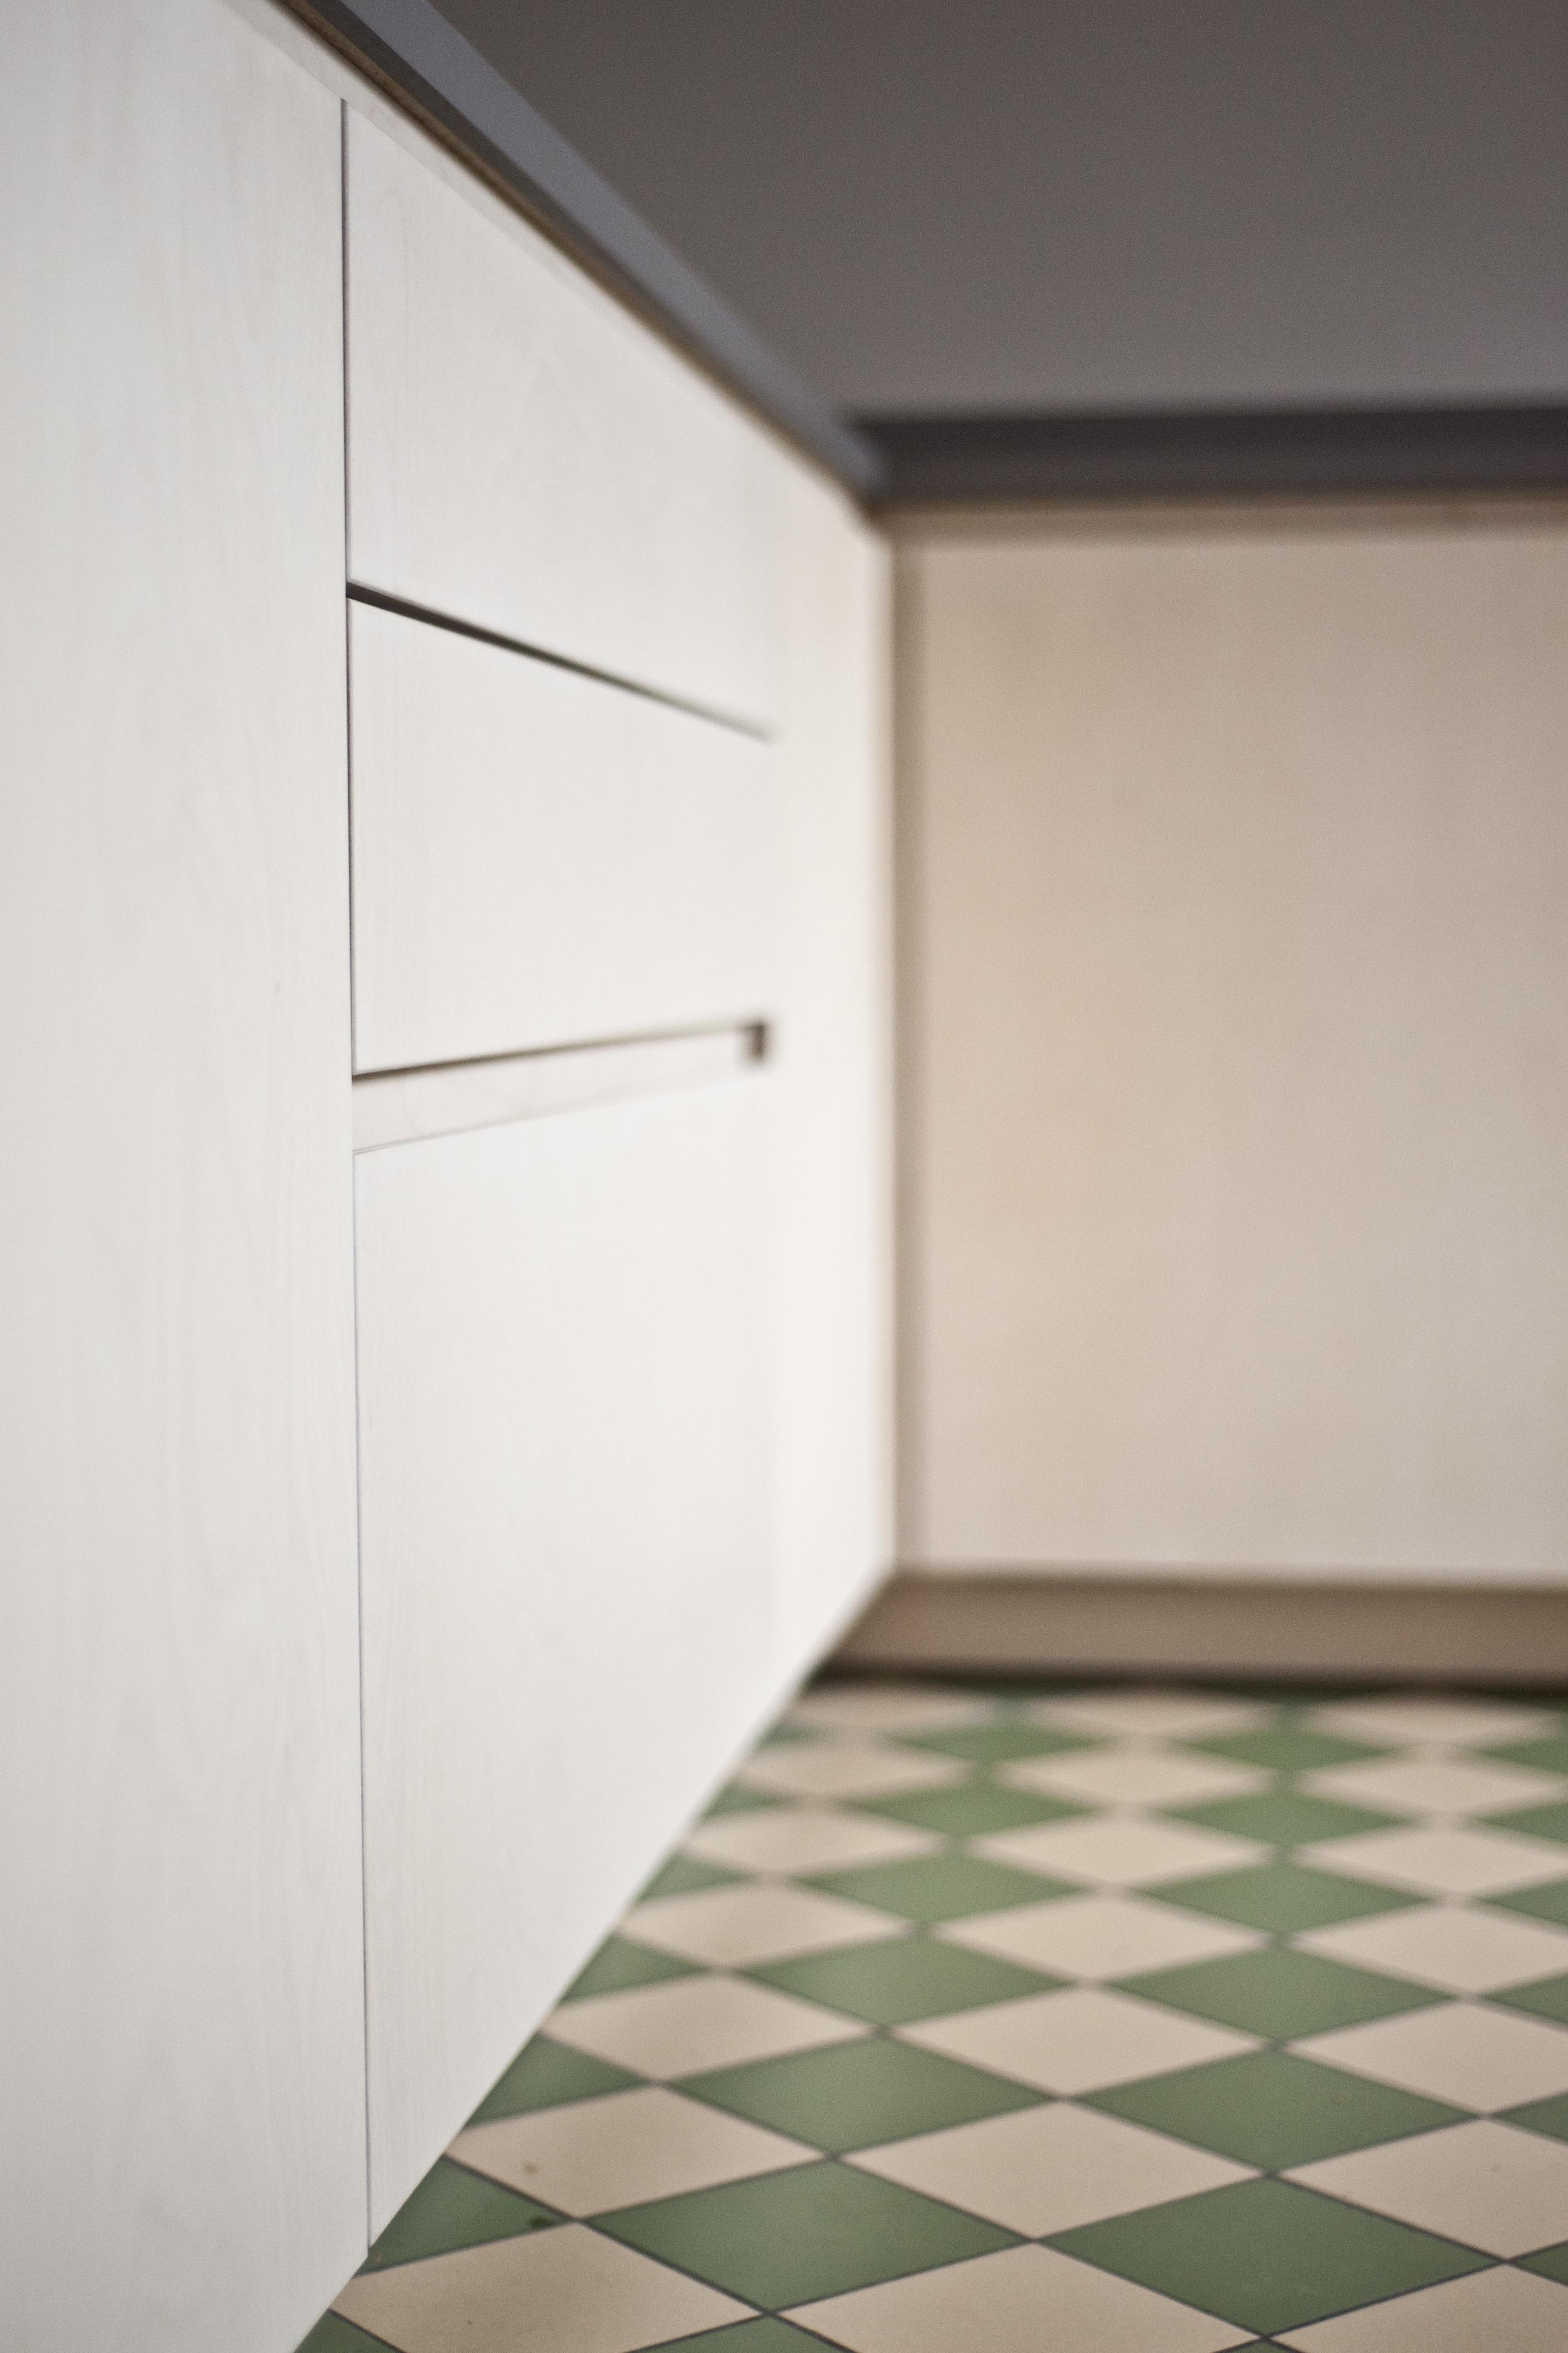 keukenkasten beschilderd